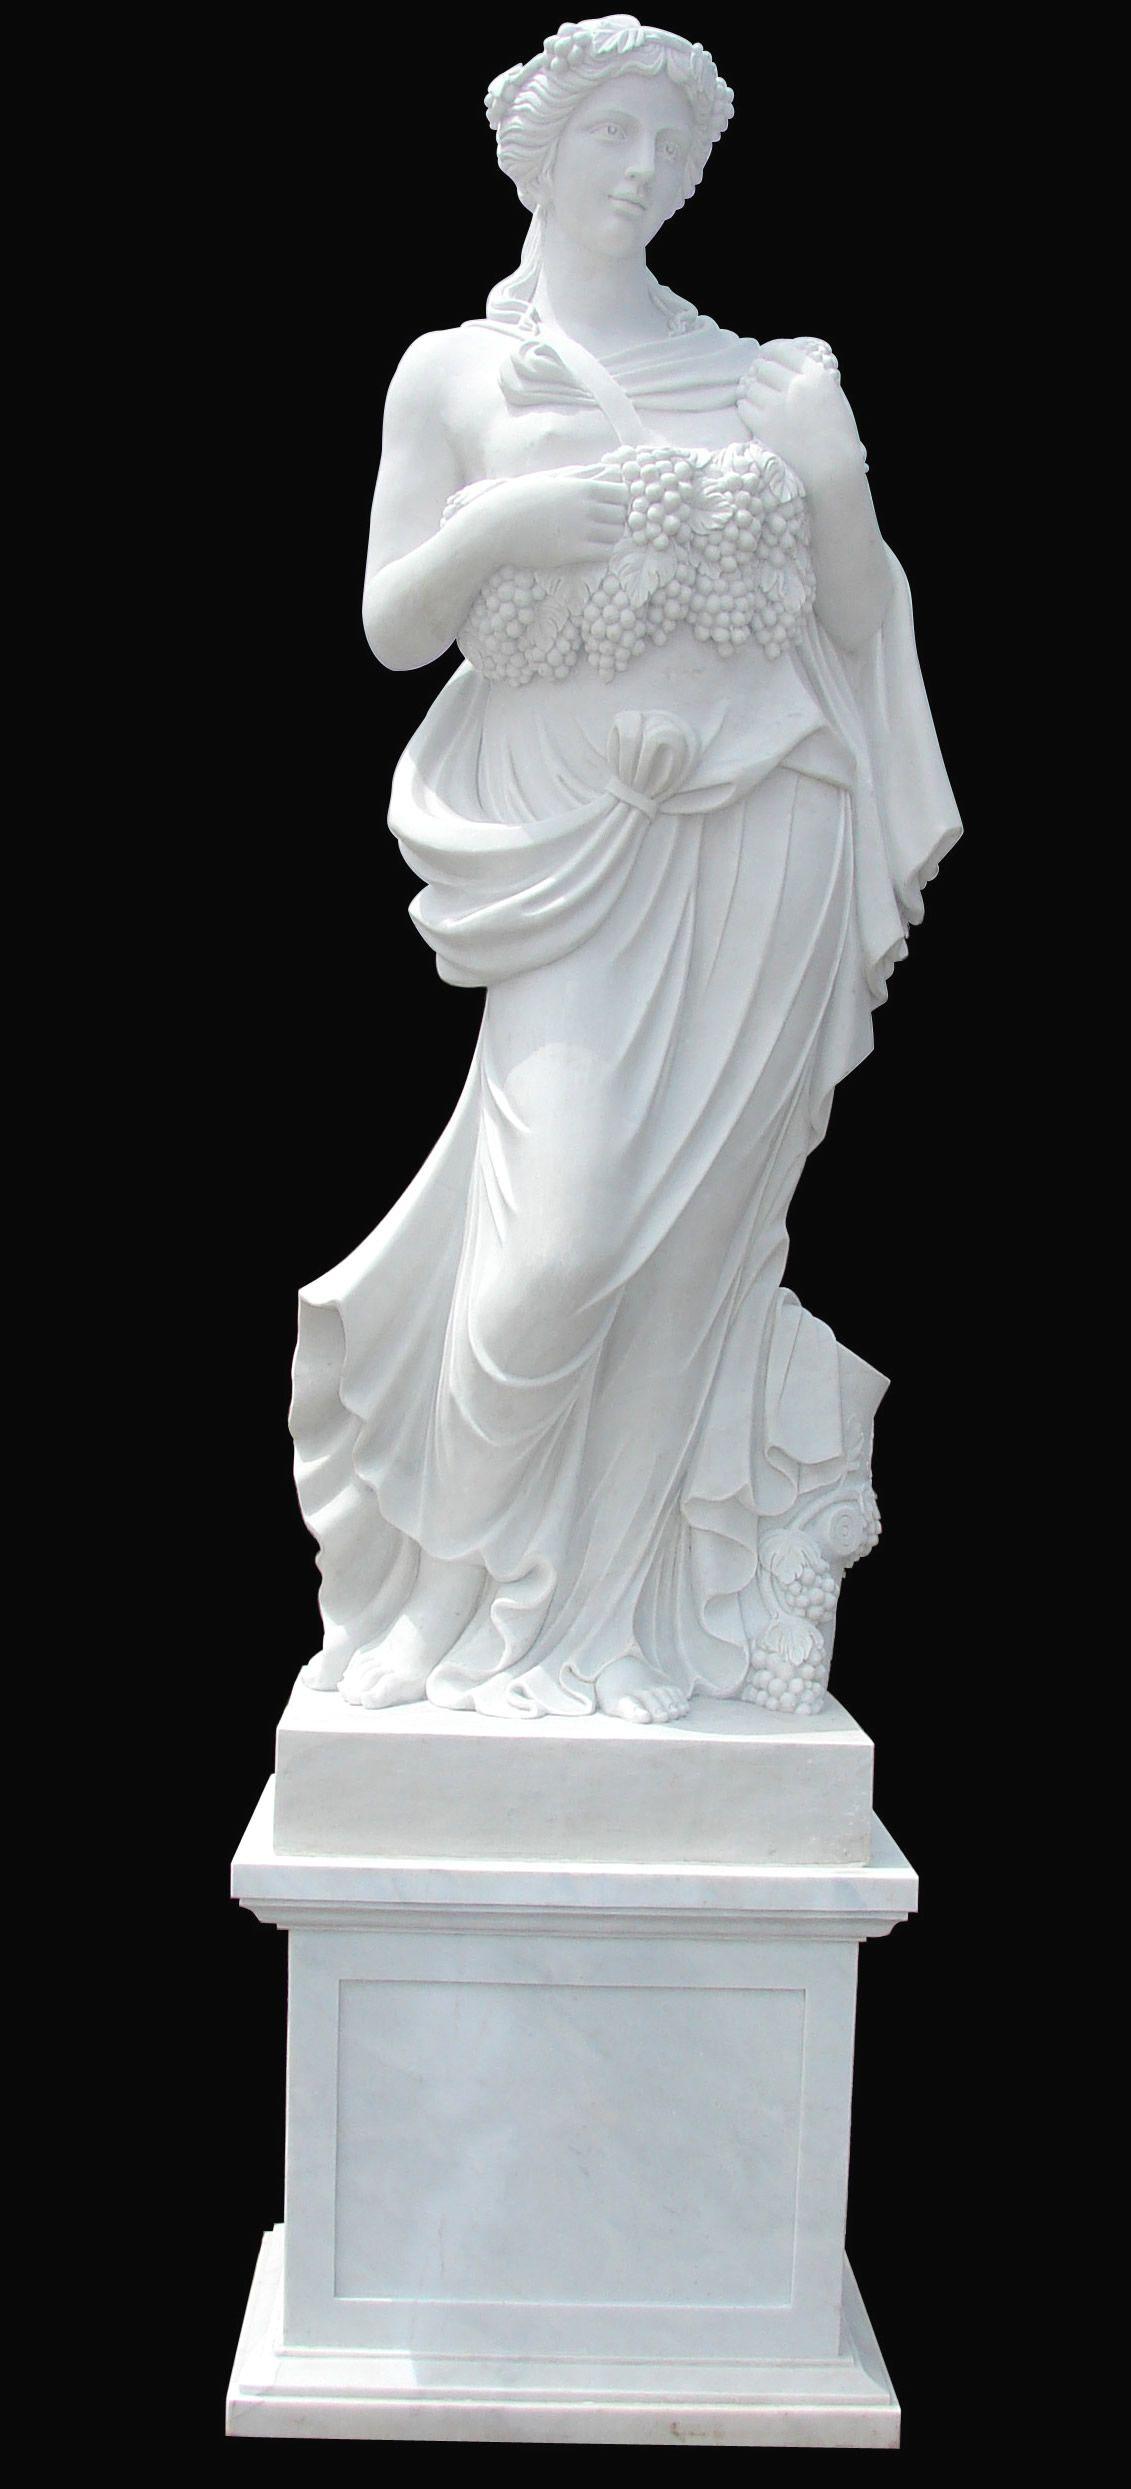 Statue White Marble Female | White Marble Statue artisan kraft ...